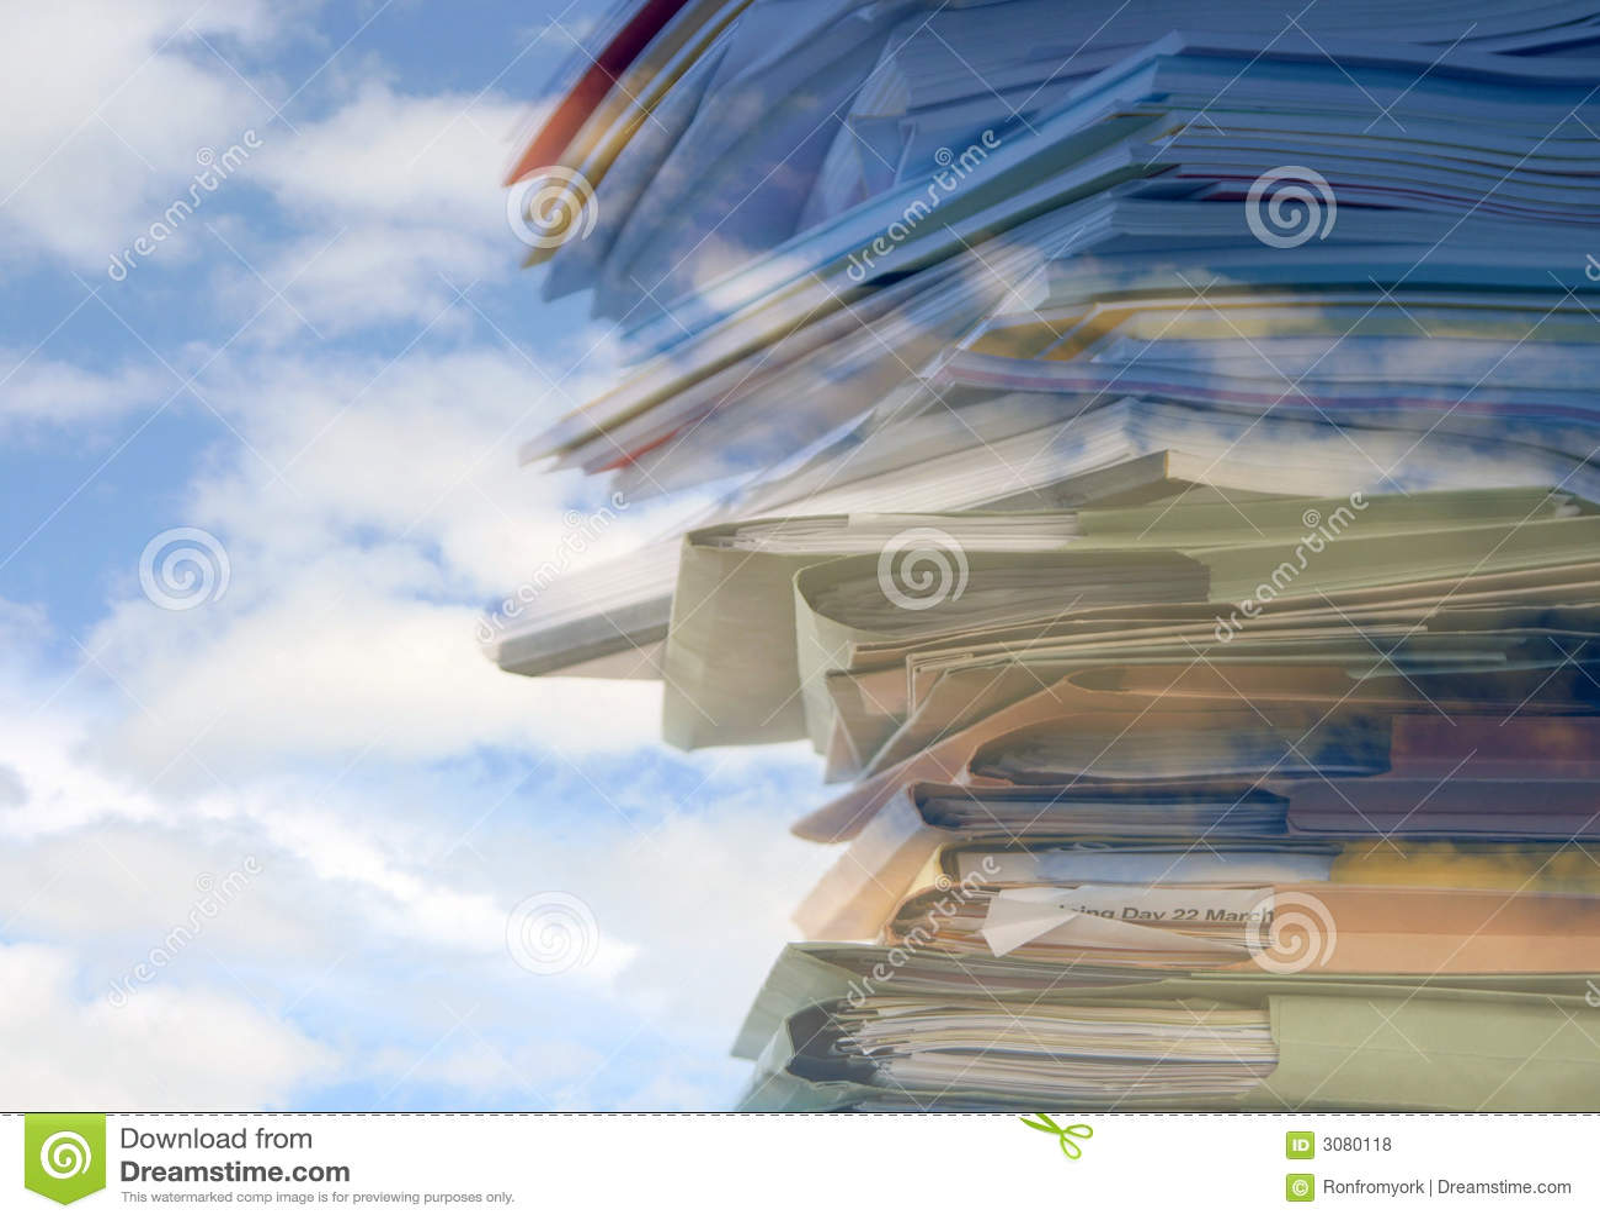 Sky high paperwork